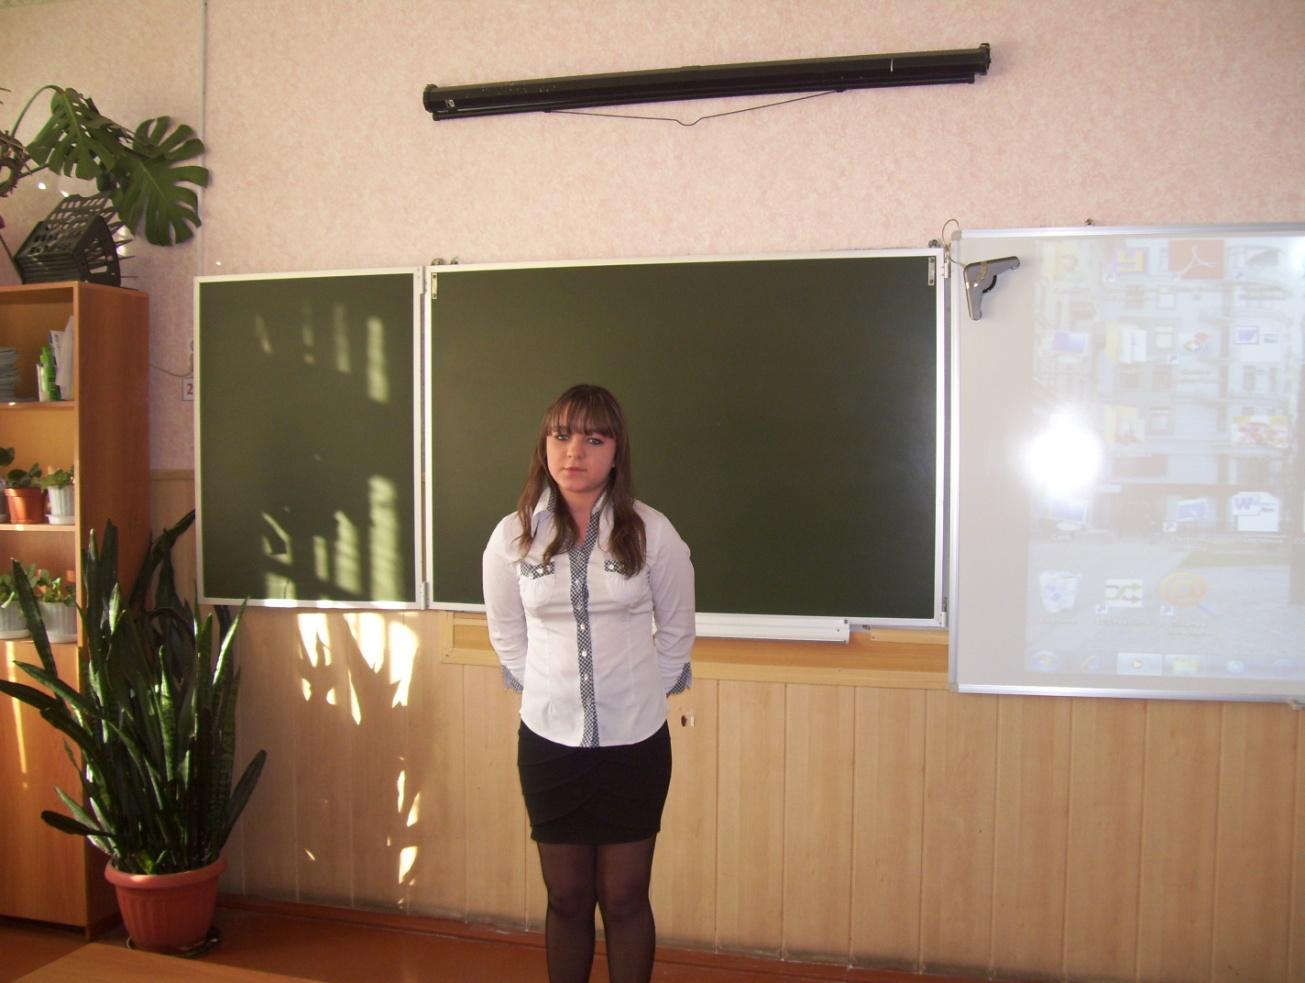 D:\фото\школа\школа 12-13\неделя рус\арбат\100_9416.JPG